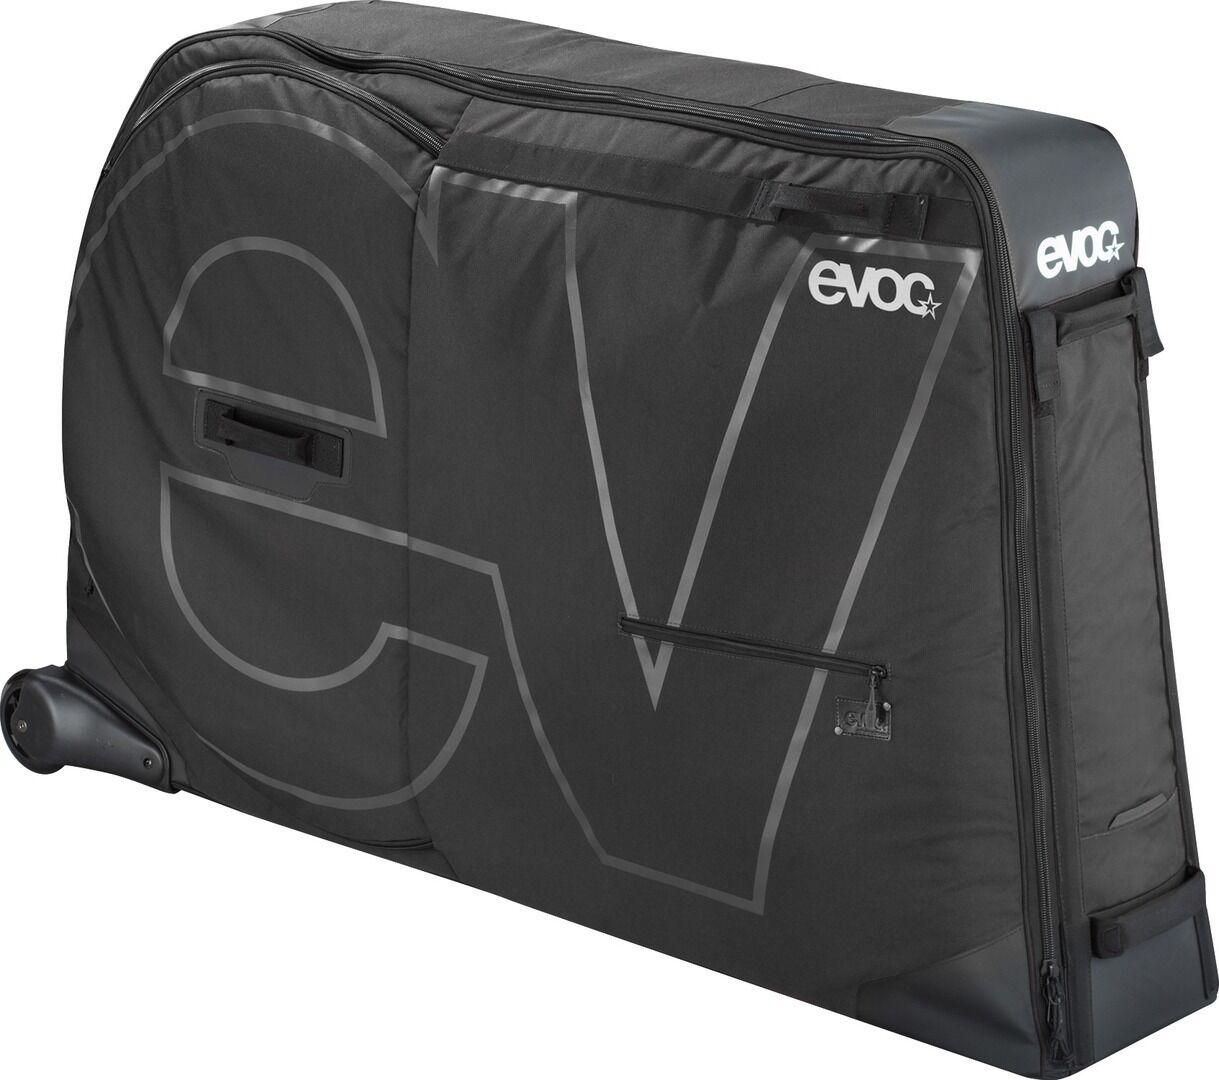 Evoc Bike Travel Bag 285L  - Black - Size: One Size